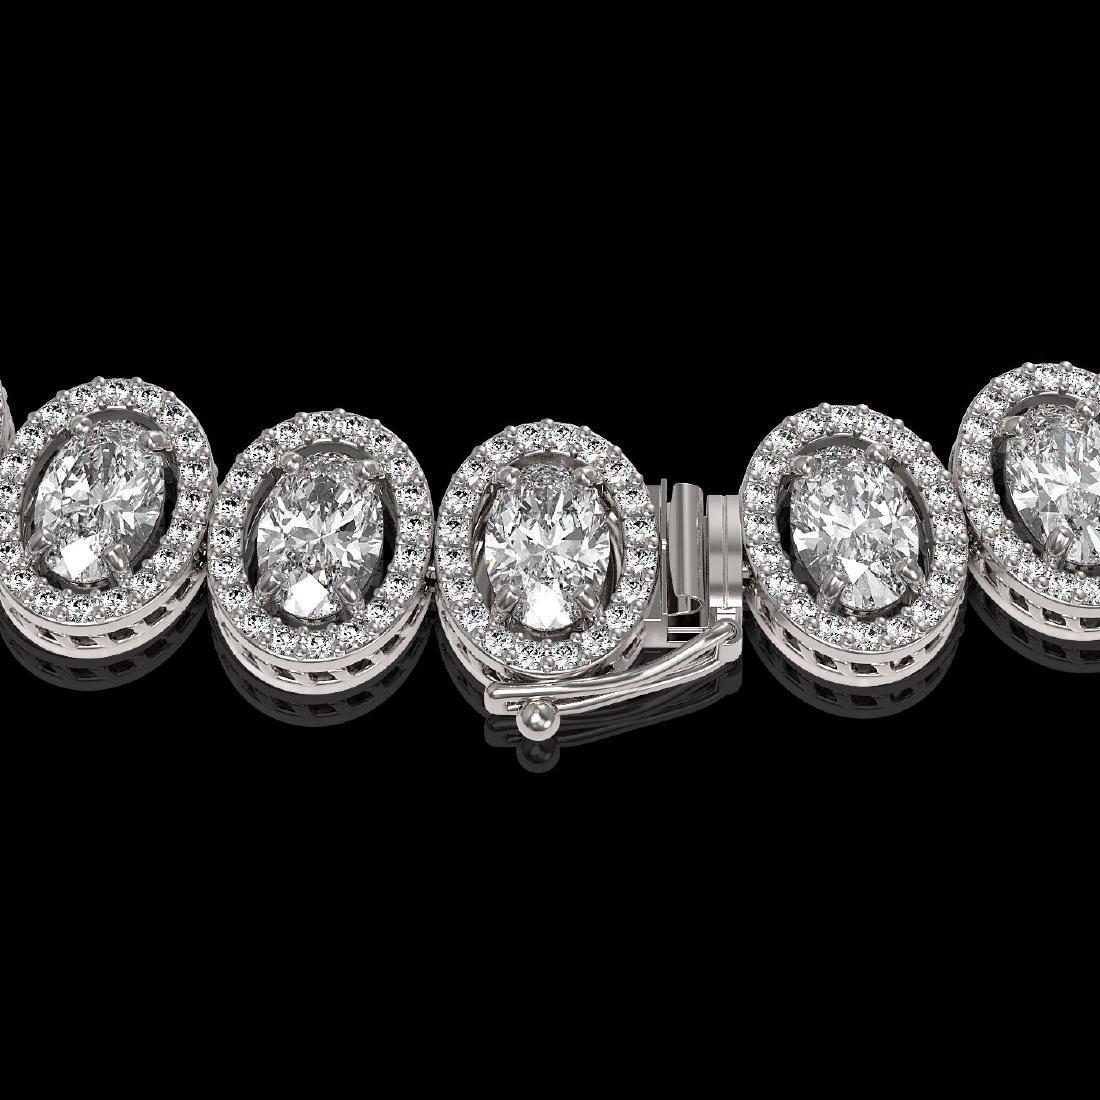 34.72 CTW Oval Diamond Designer Necklace 18K White Gold - 3